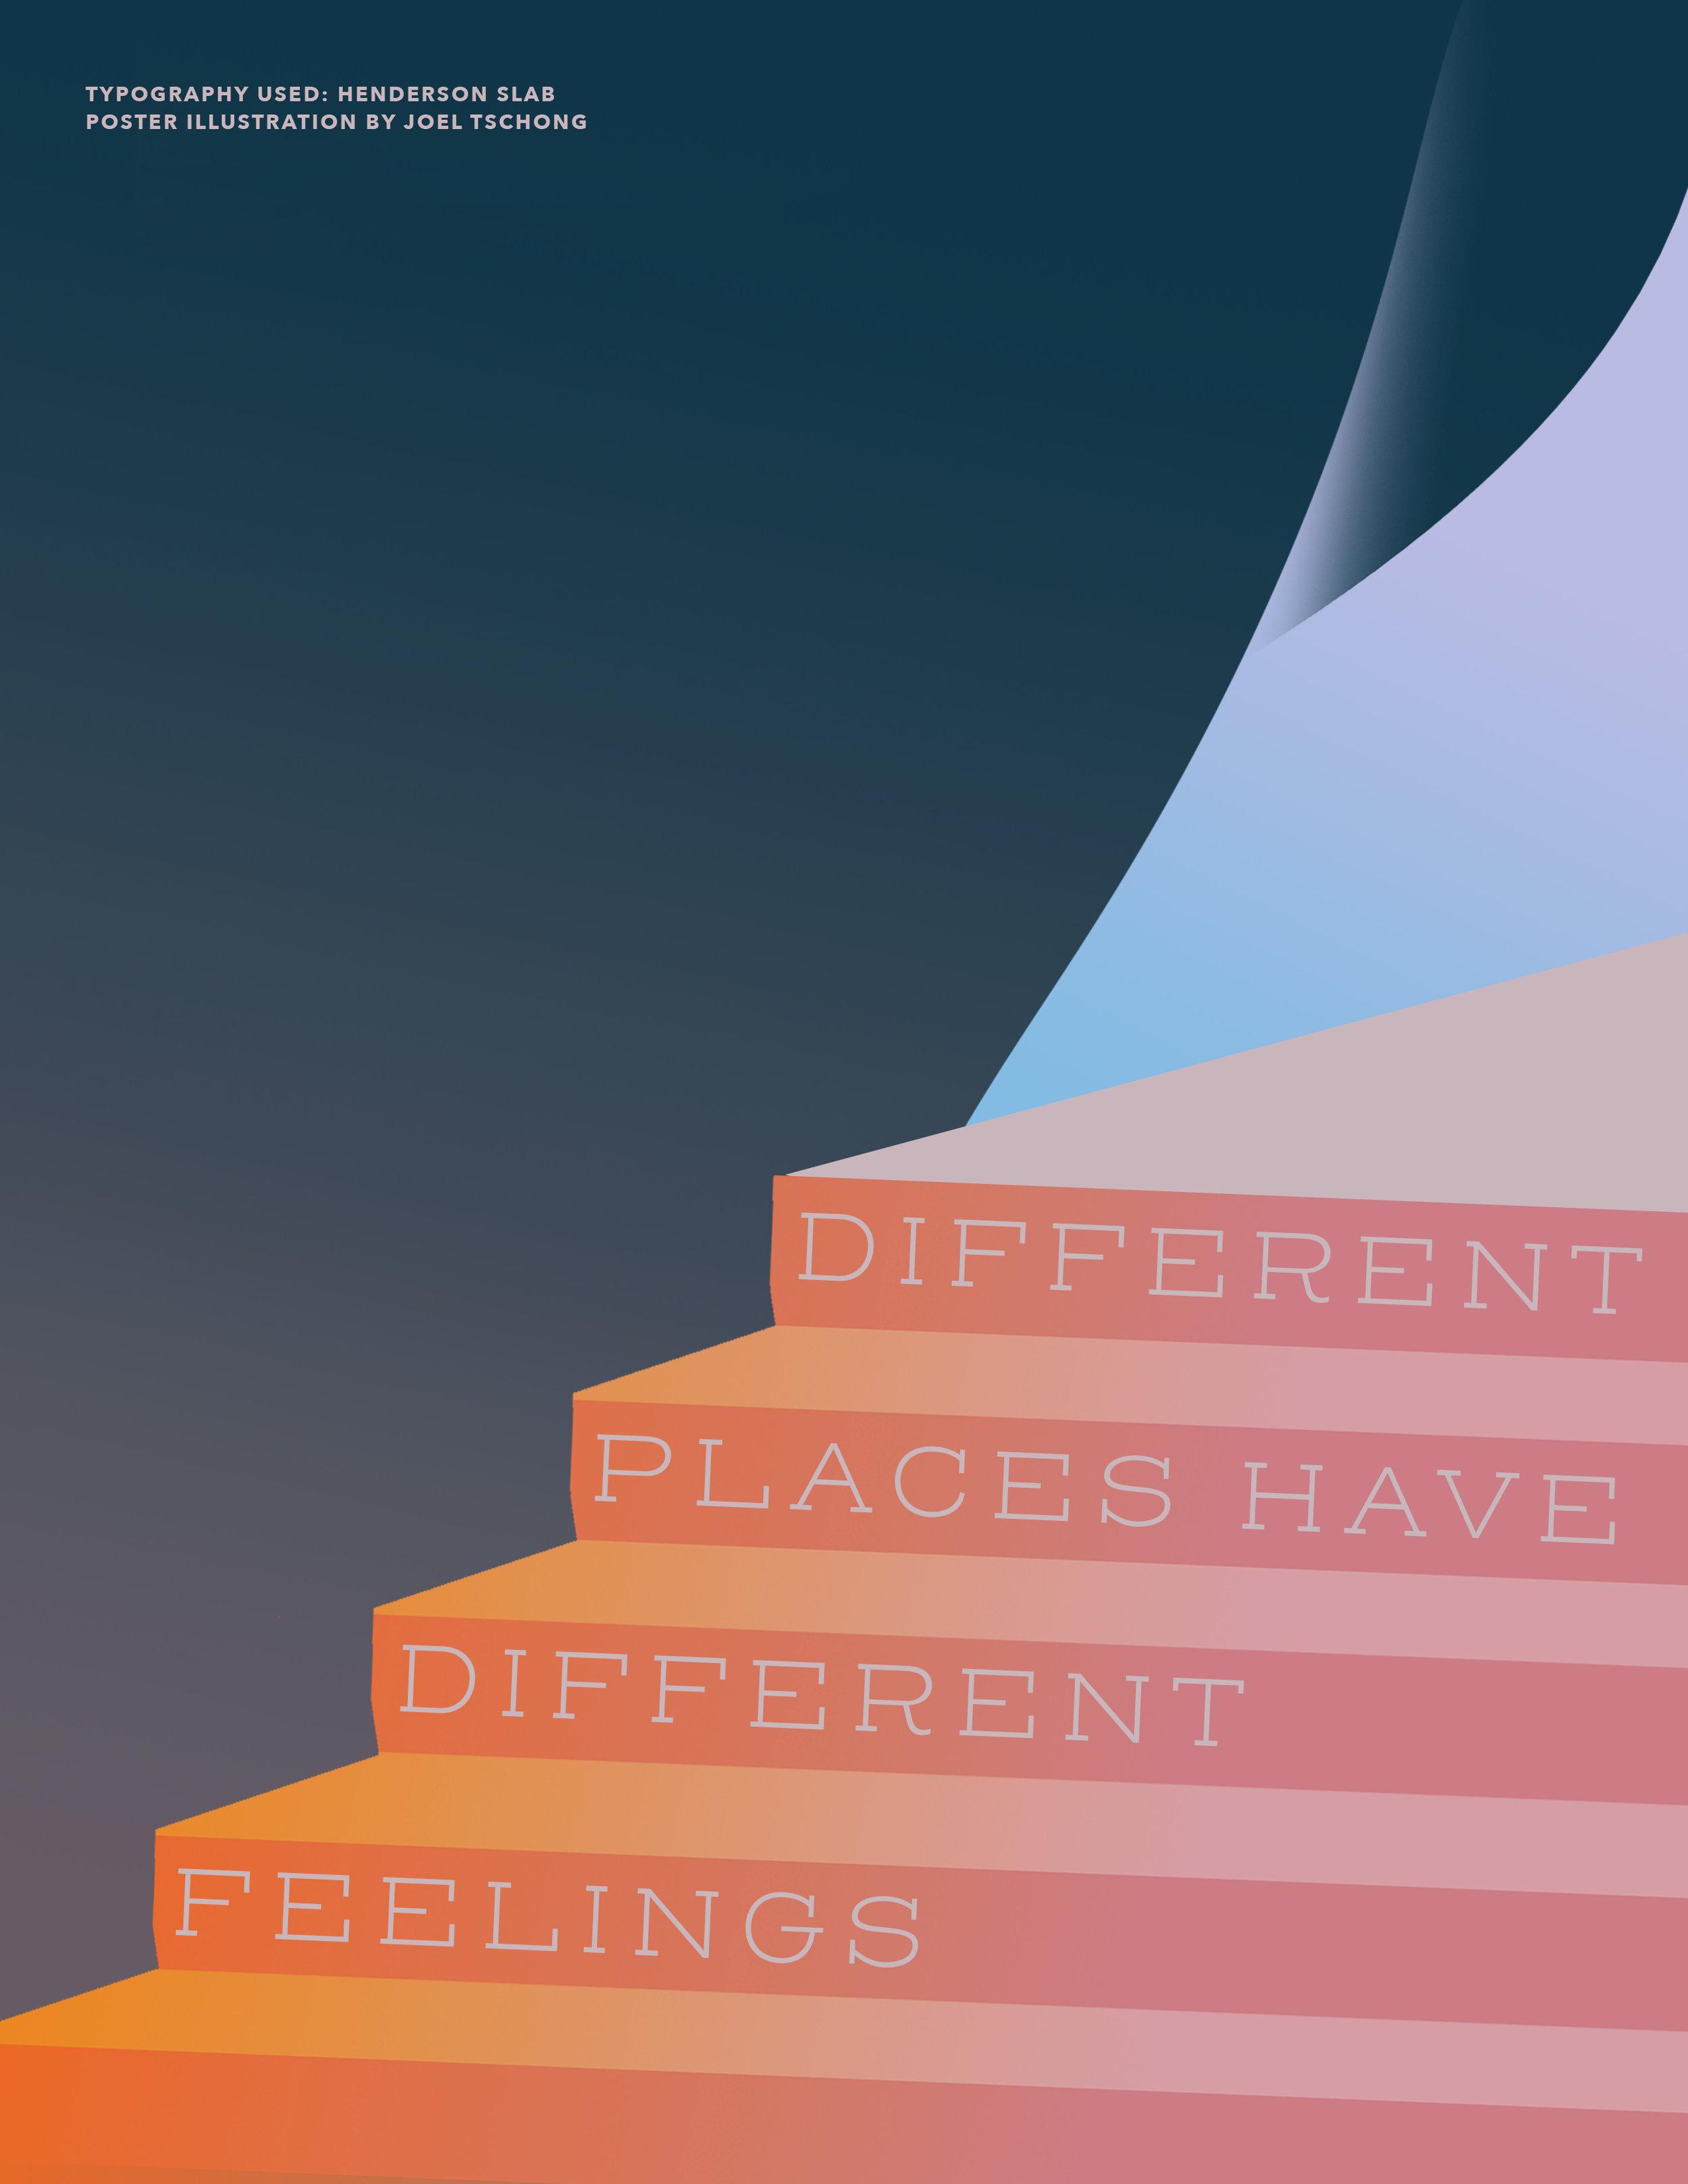 differentplaces.jpg